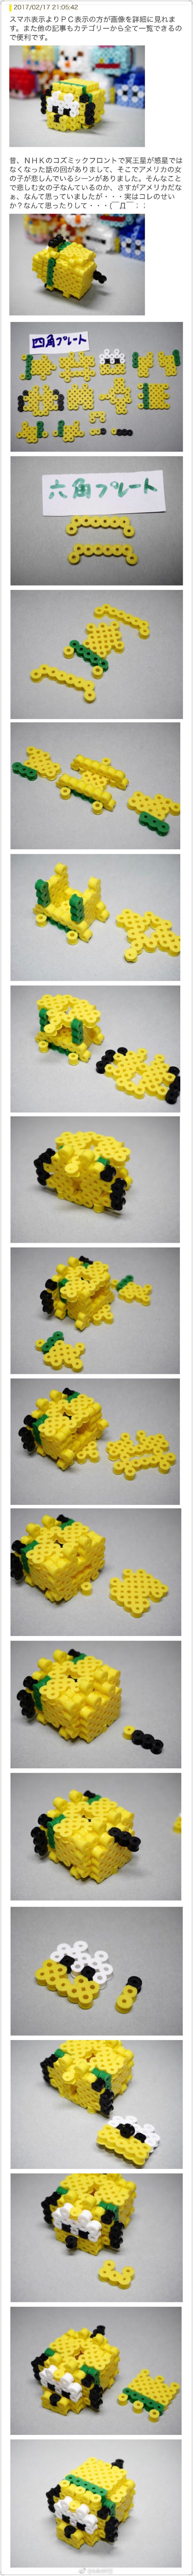 Beads Crafts DisneyDiy Y Abalorios Pluto 3d HamaHama 53AL4Rjq